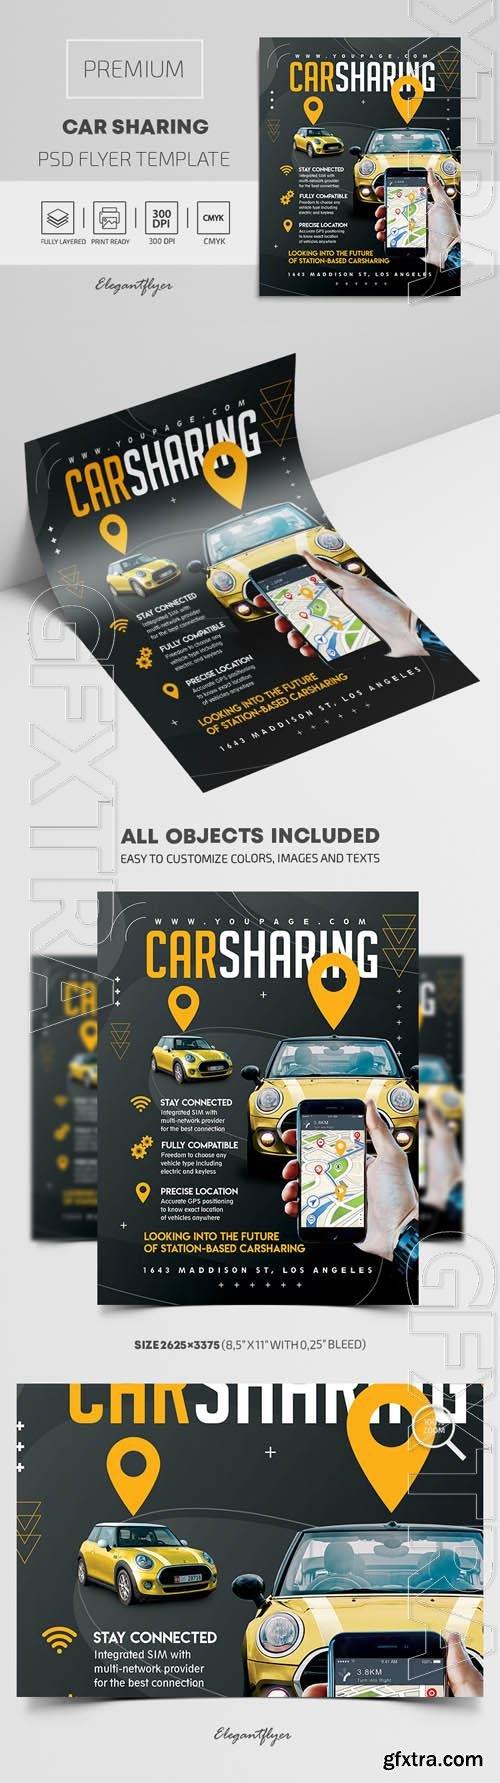 Car Sharing Premium PSD Flyer Template